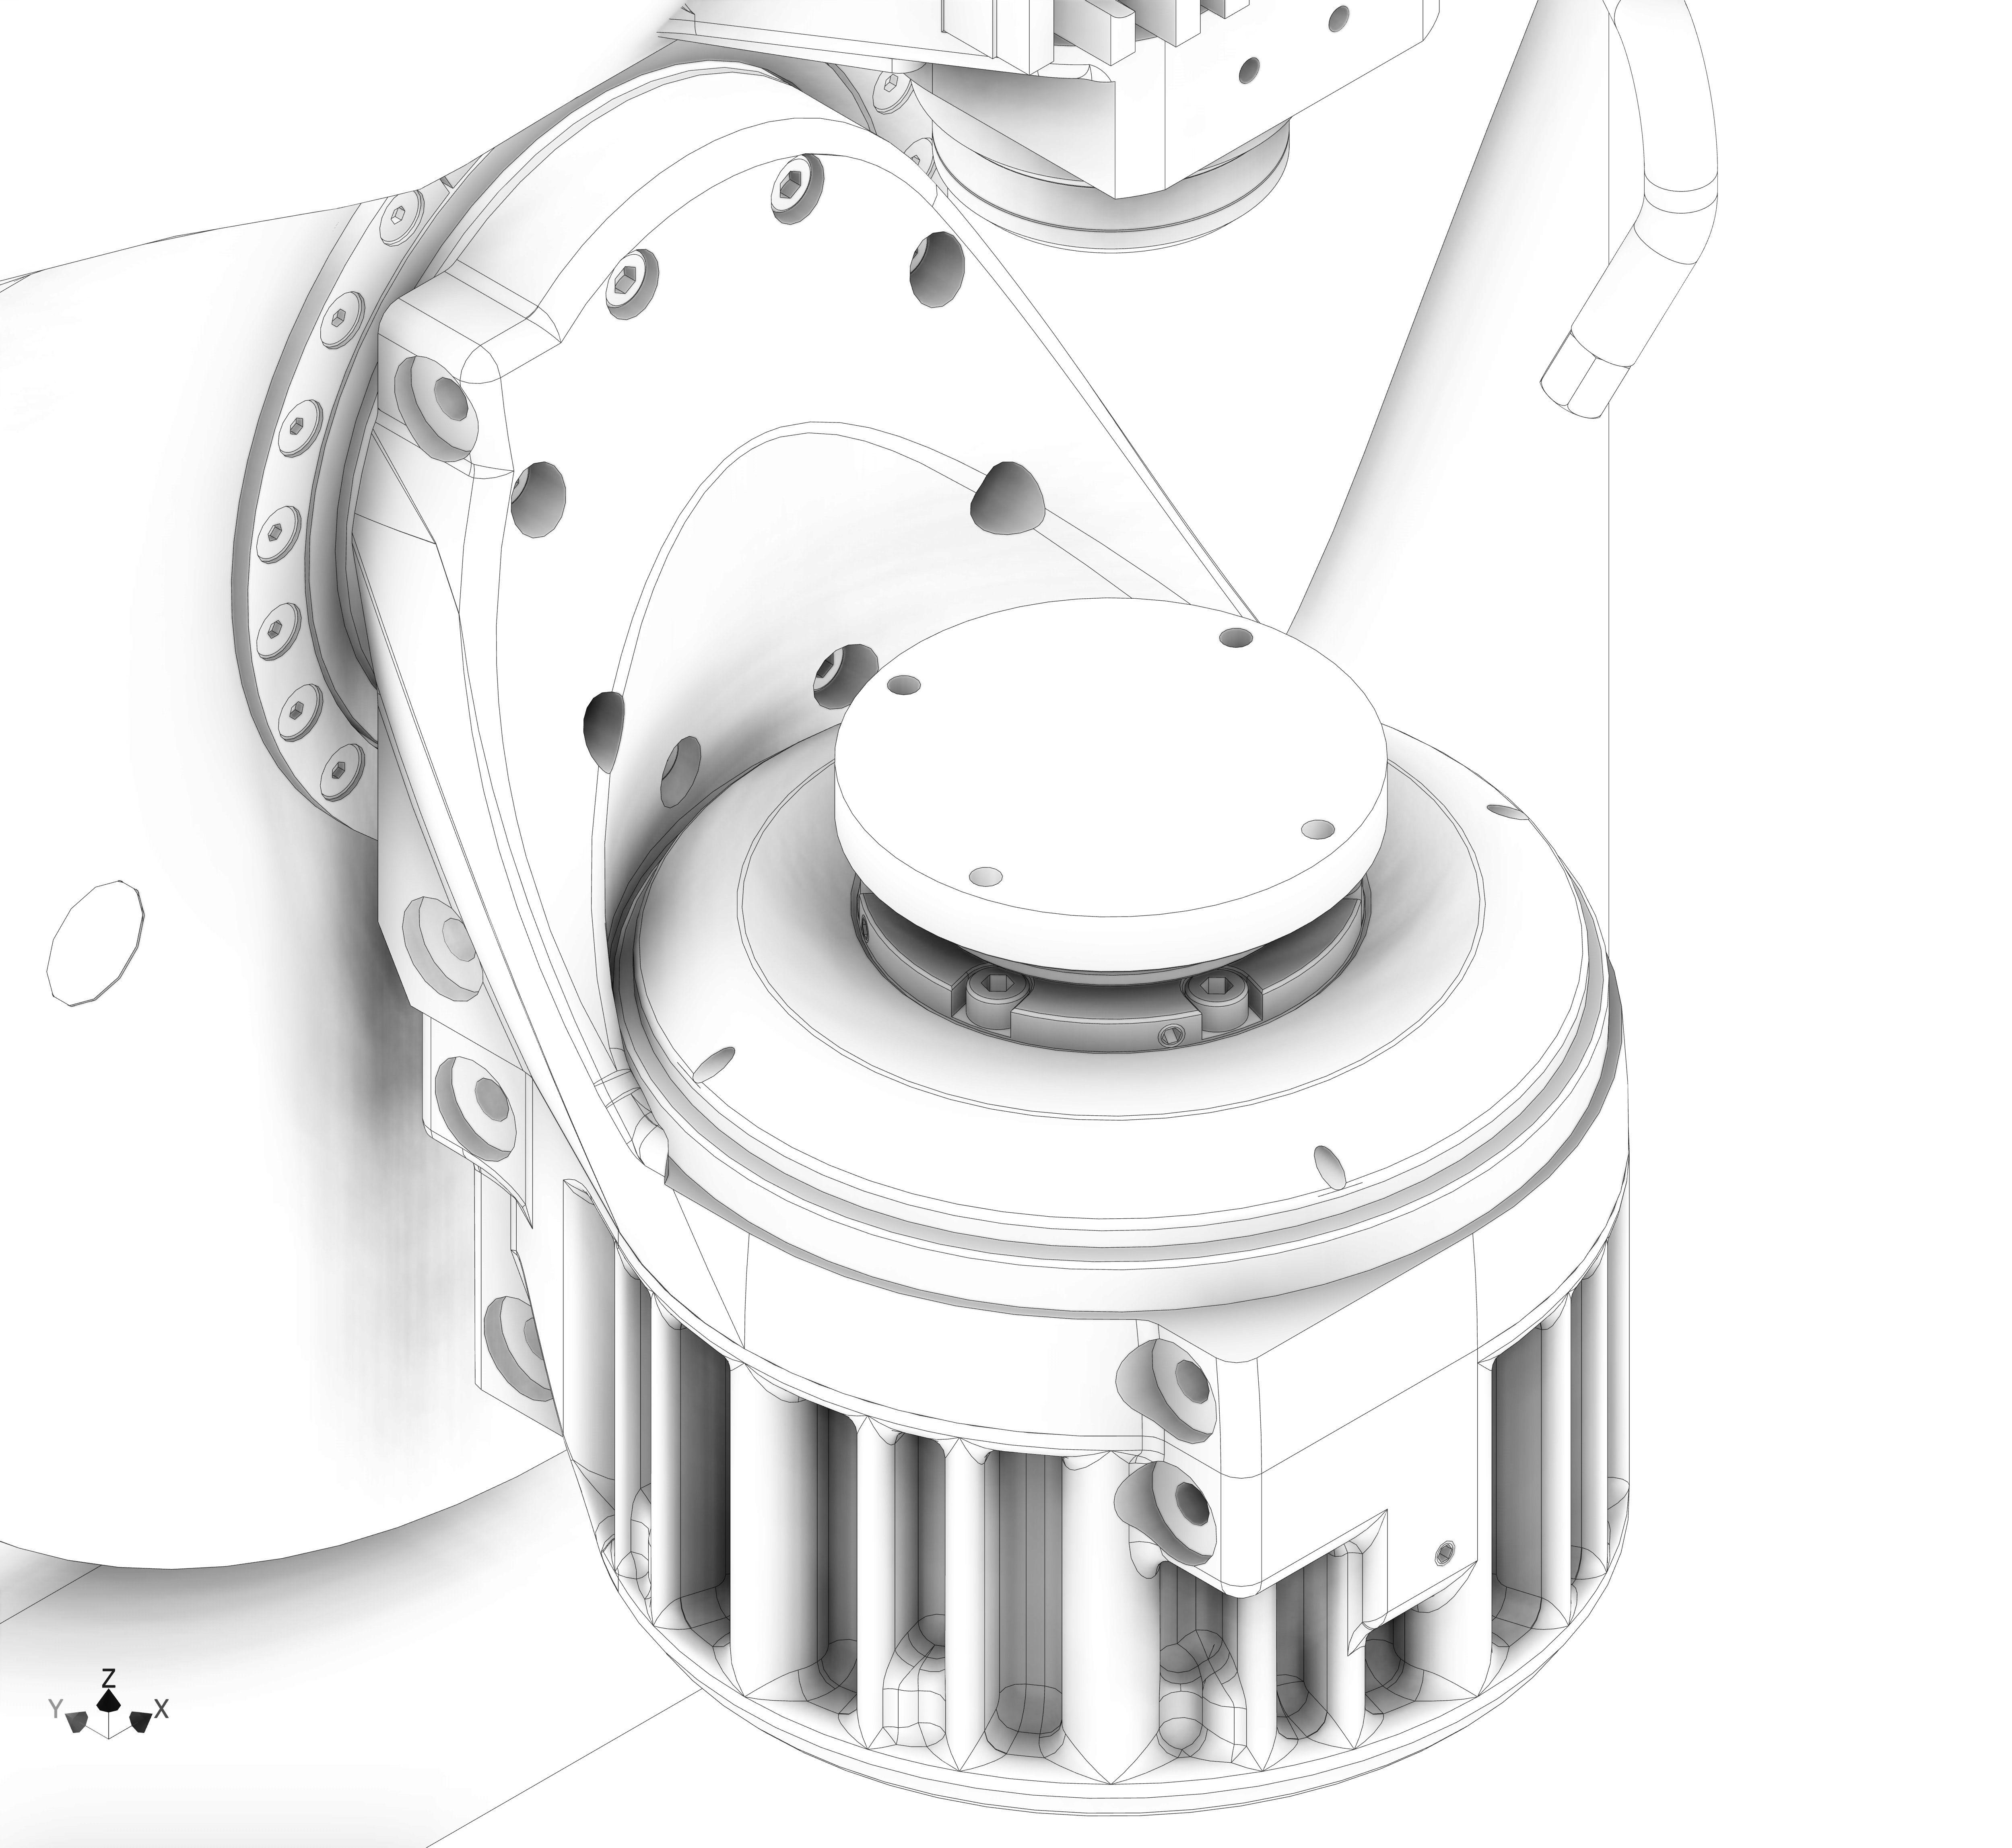 Axes rotatifs de la Micro5 en schéma